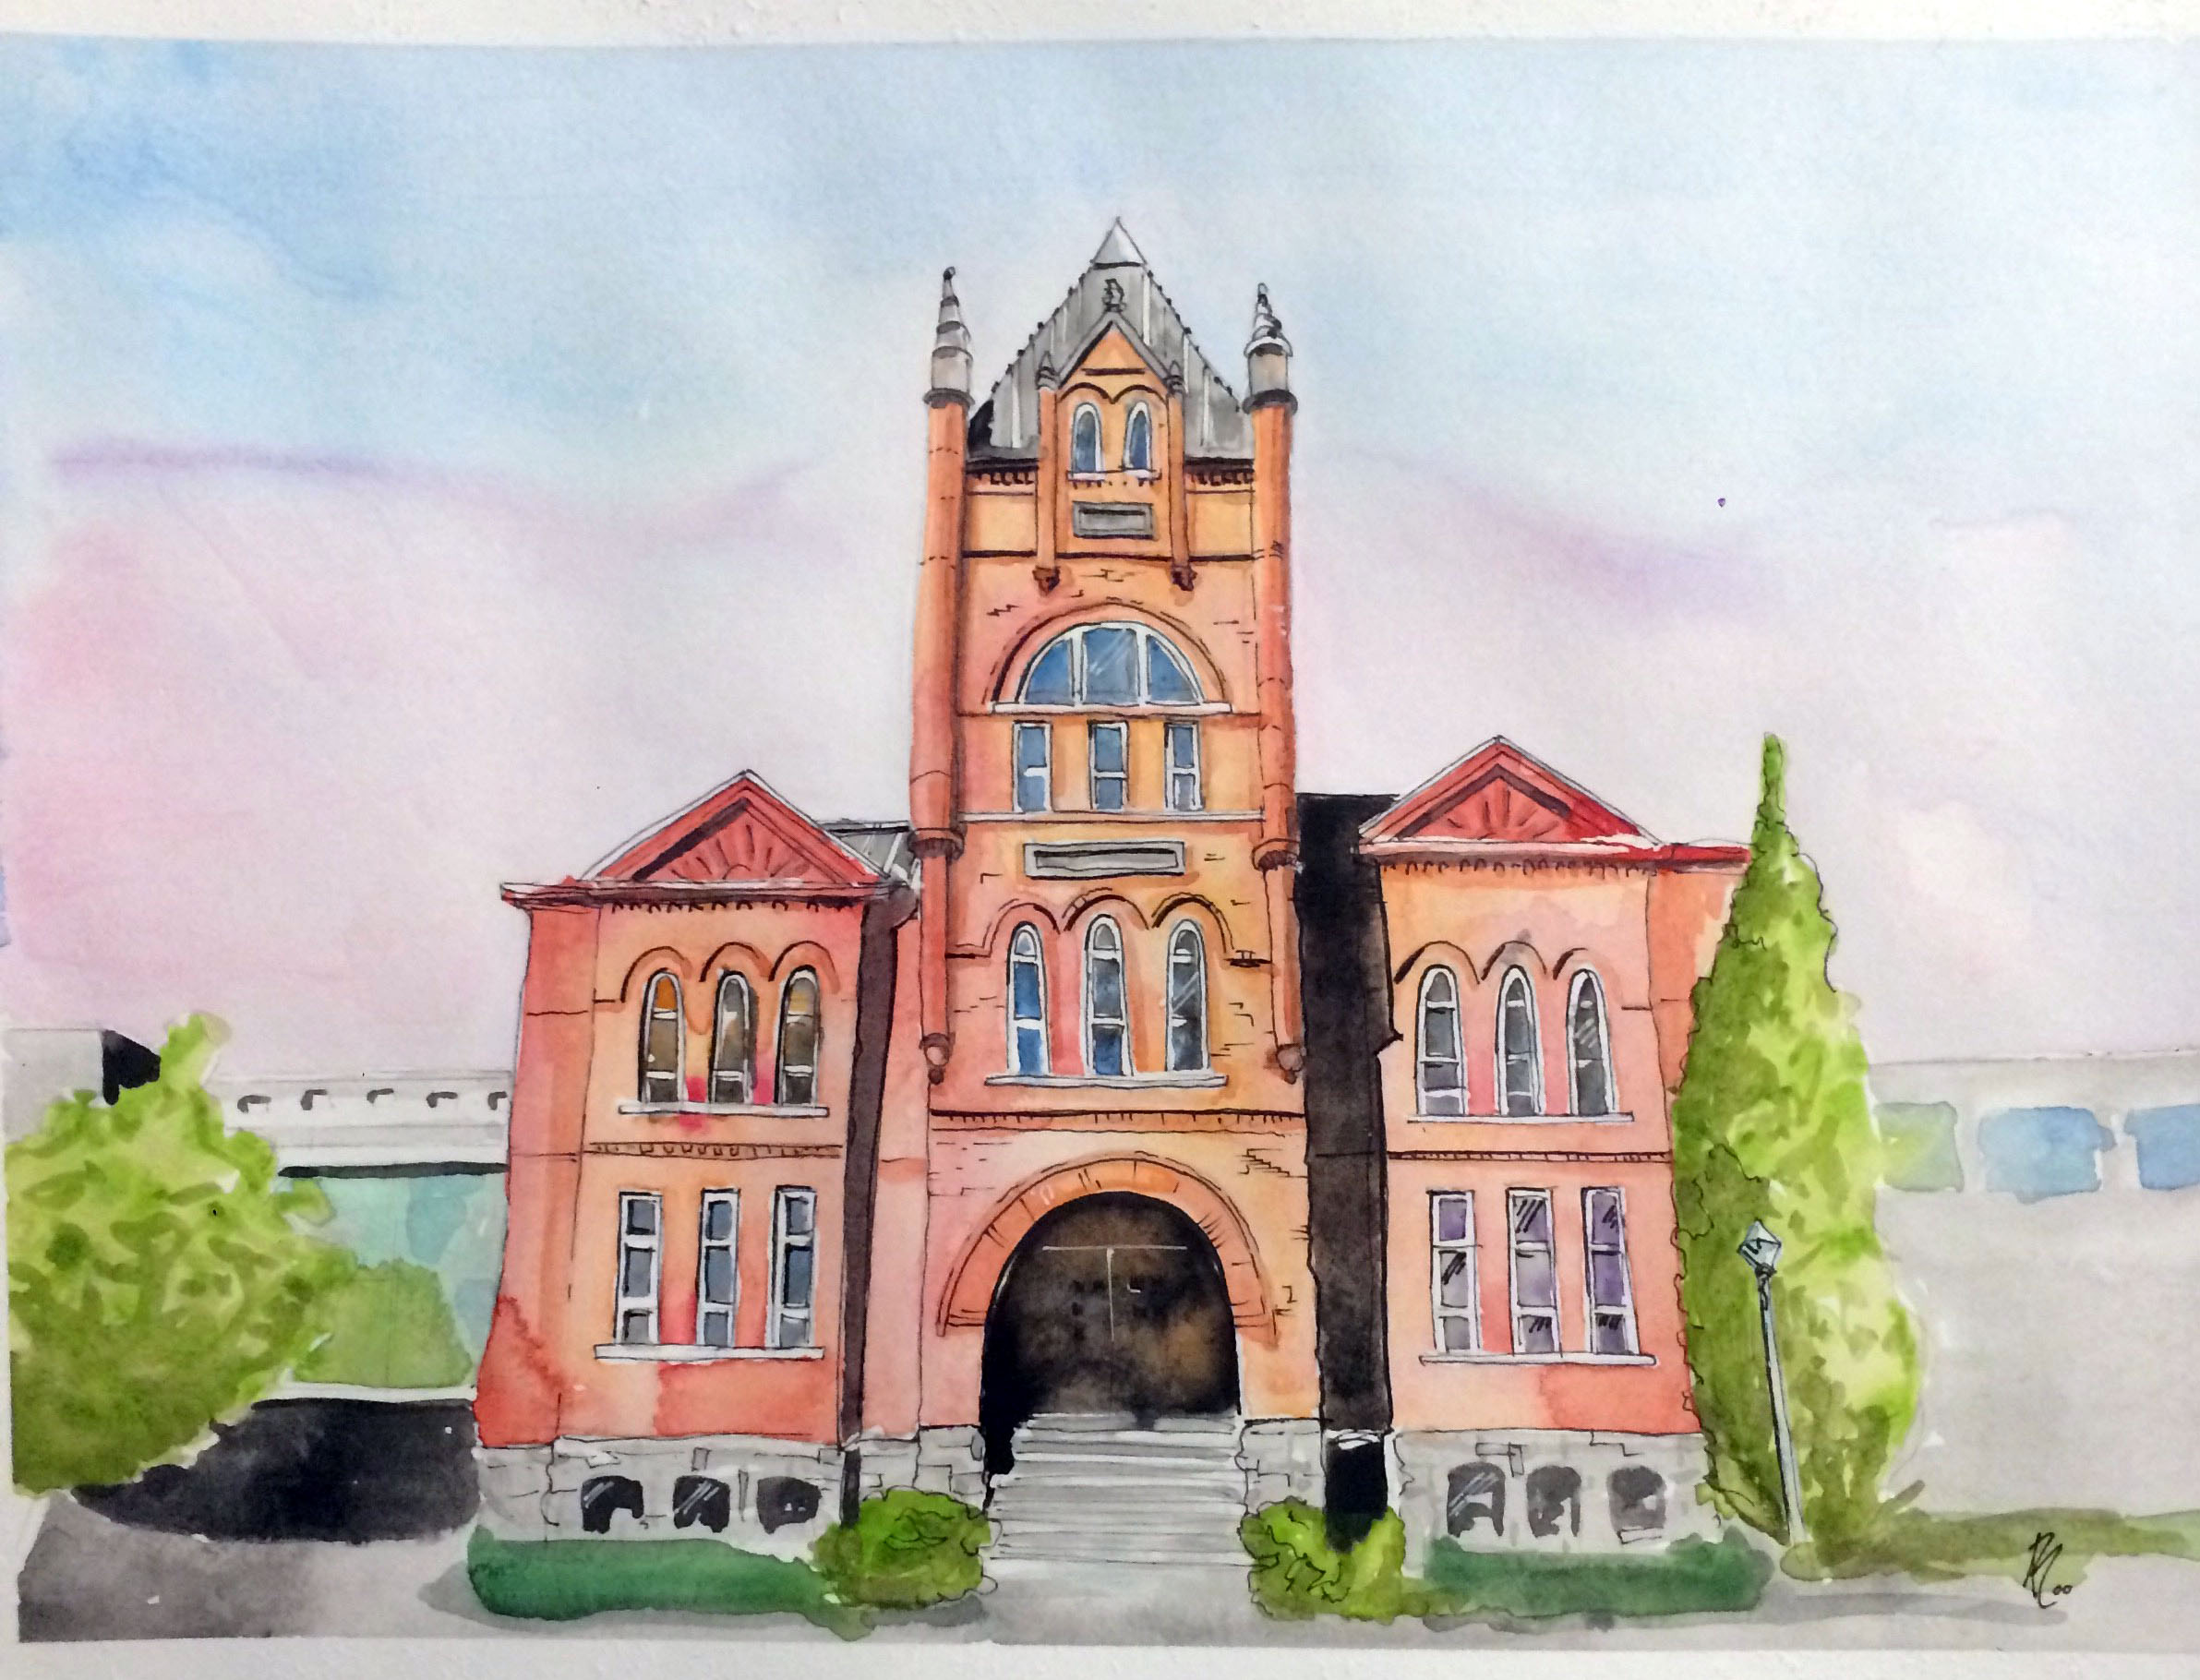 10 - Goodes Hall